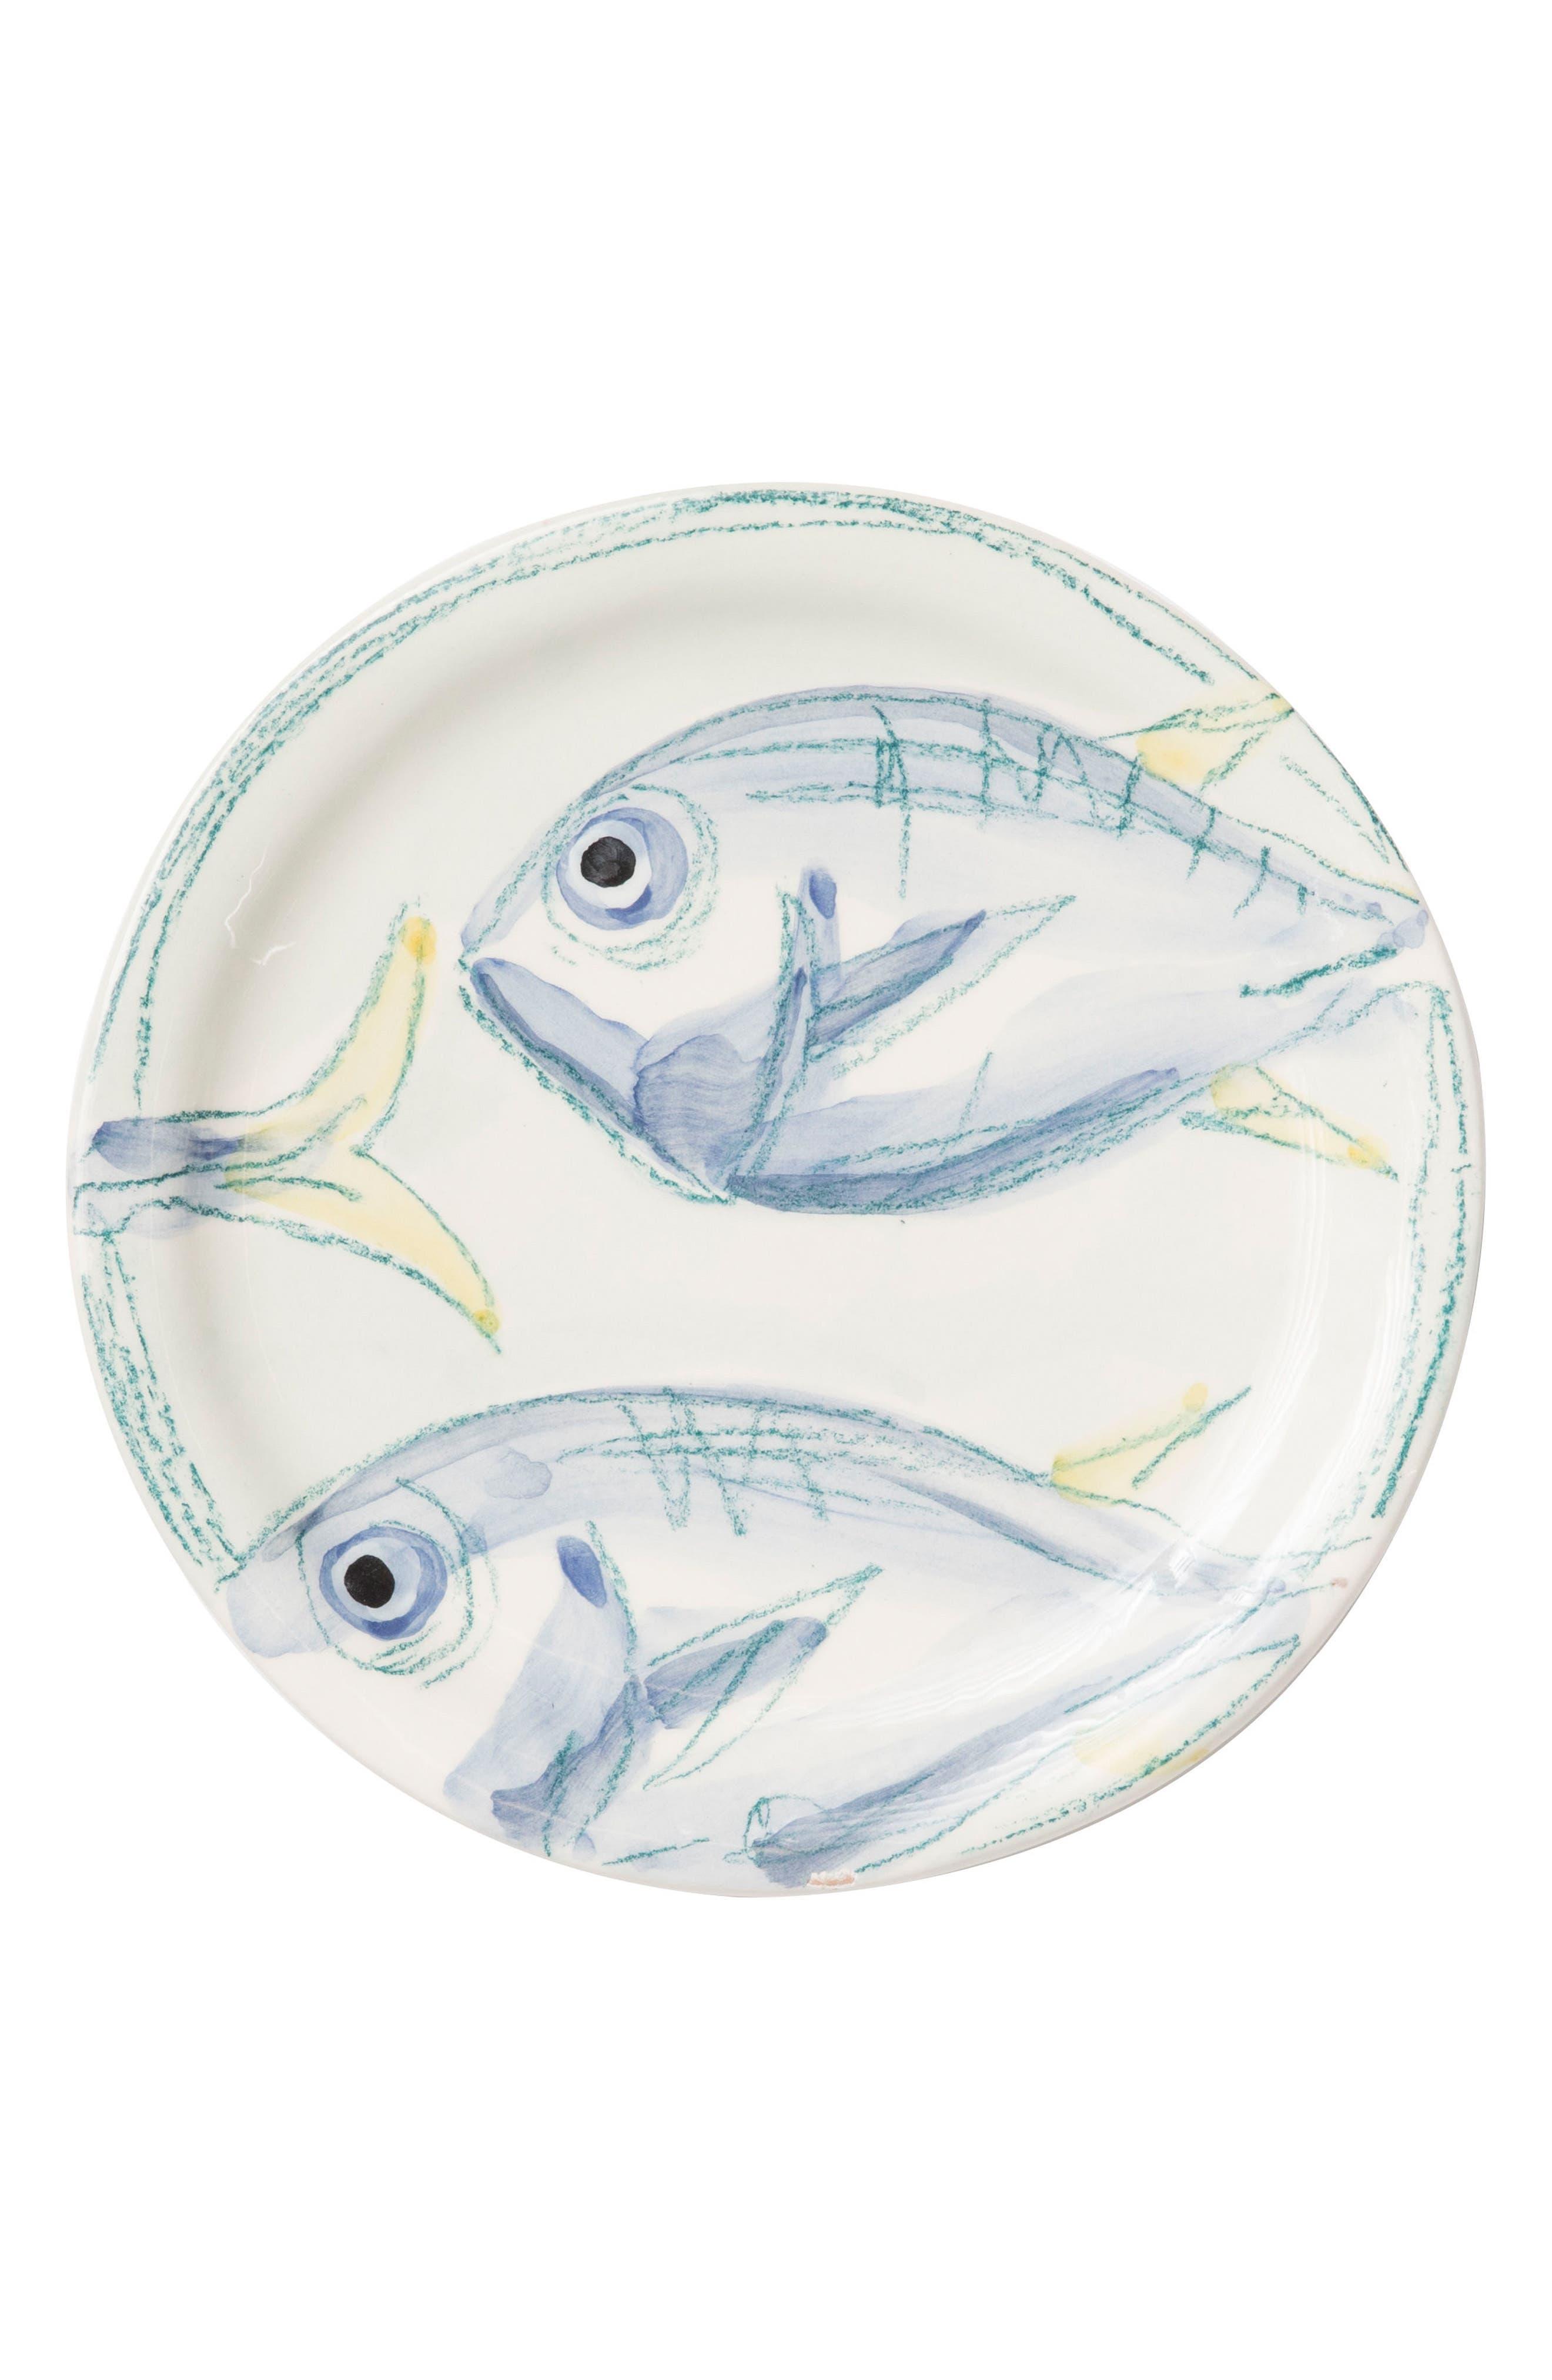 Pescatore Salad Plate,                             Main thumbnail 1, color,                             White